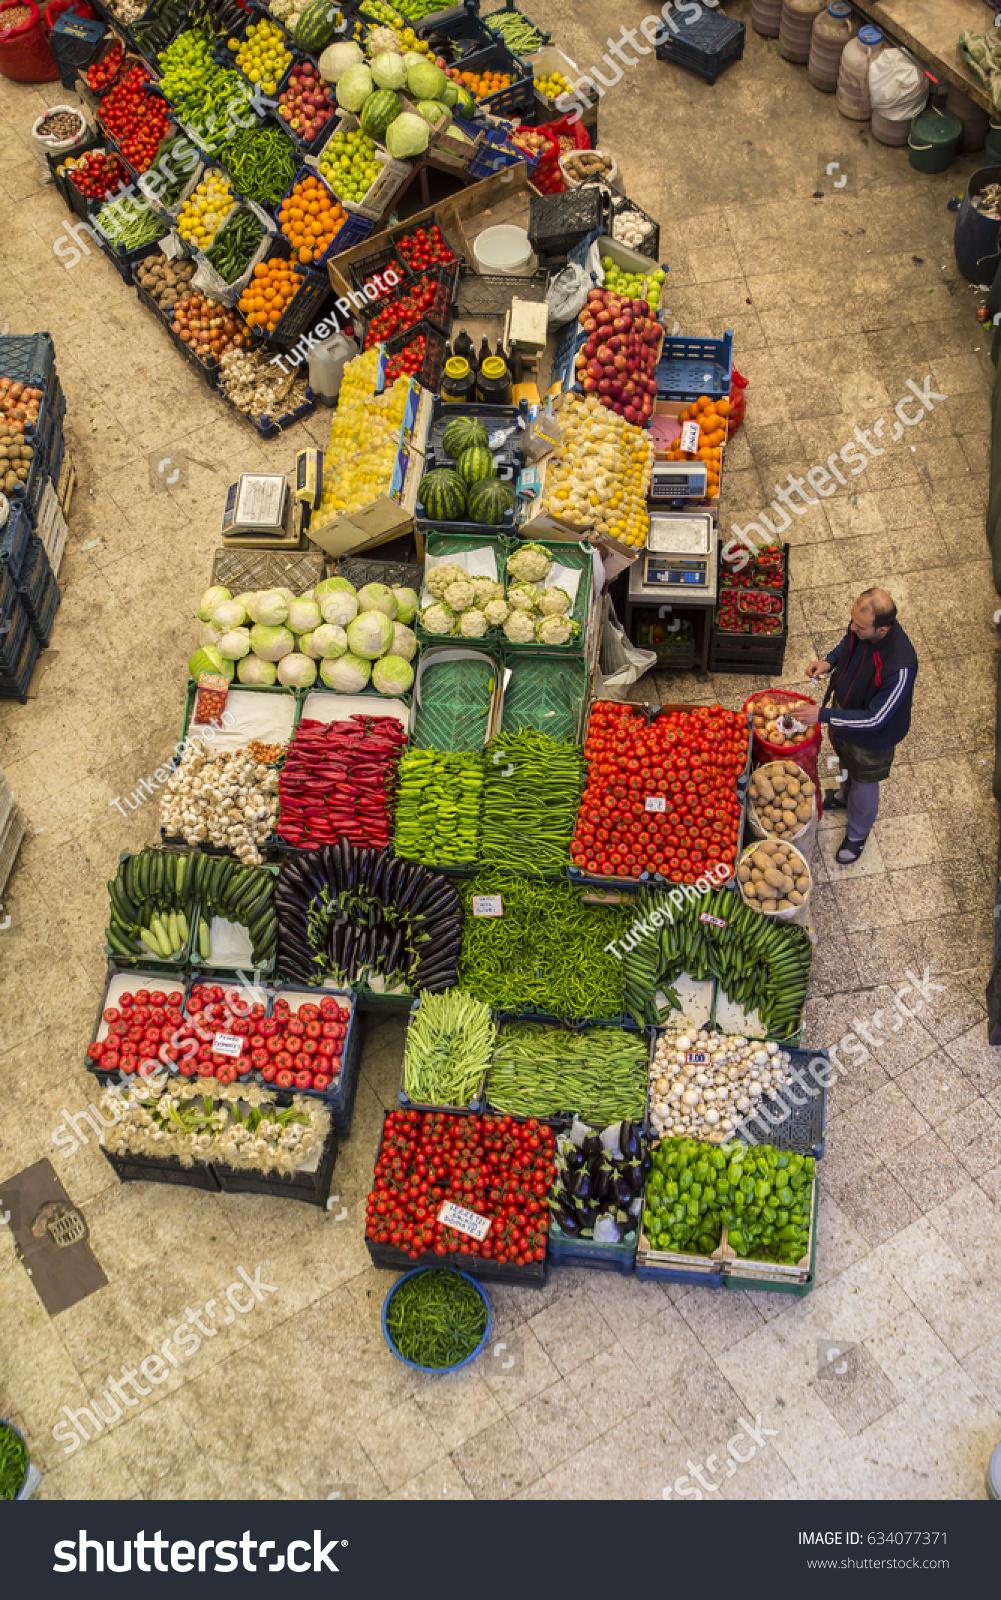 stock-photo-konya-turkey-april-melike-ha